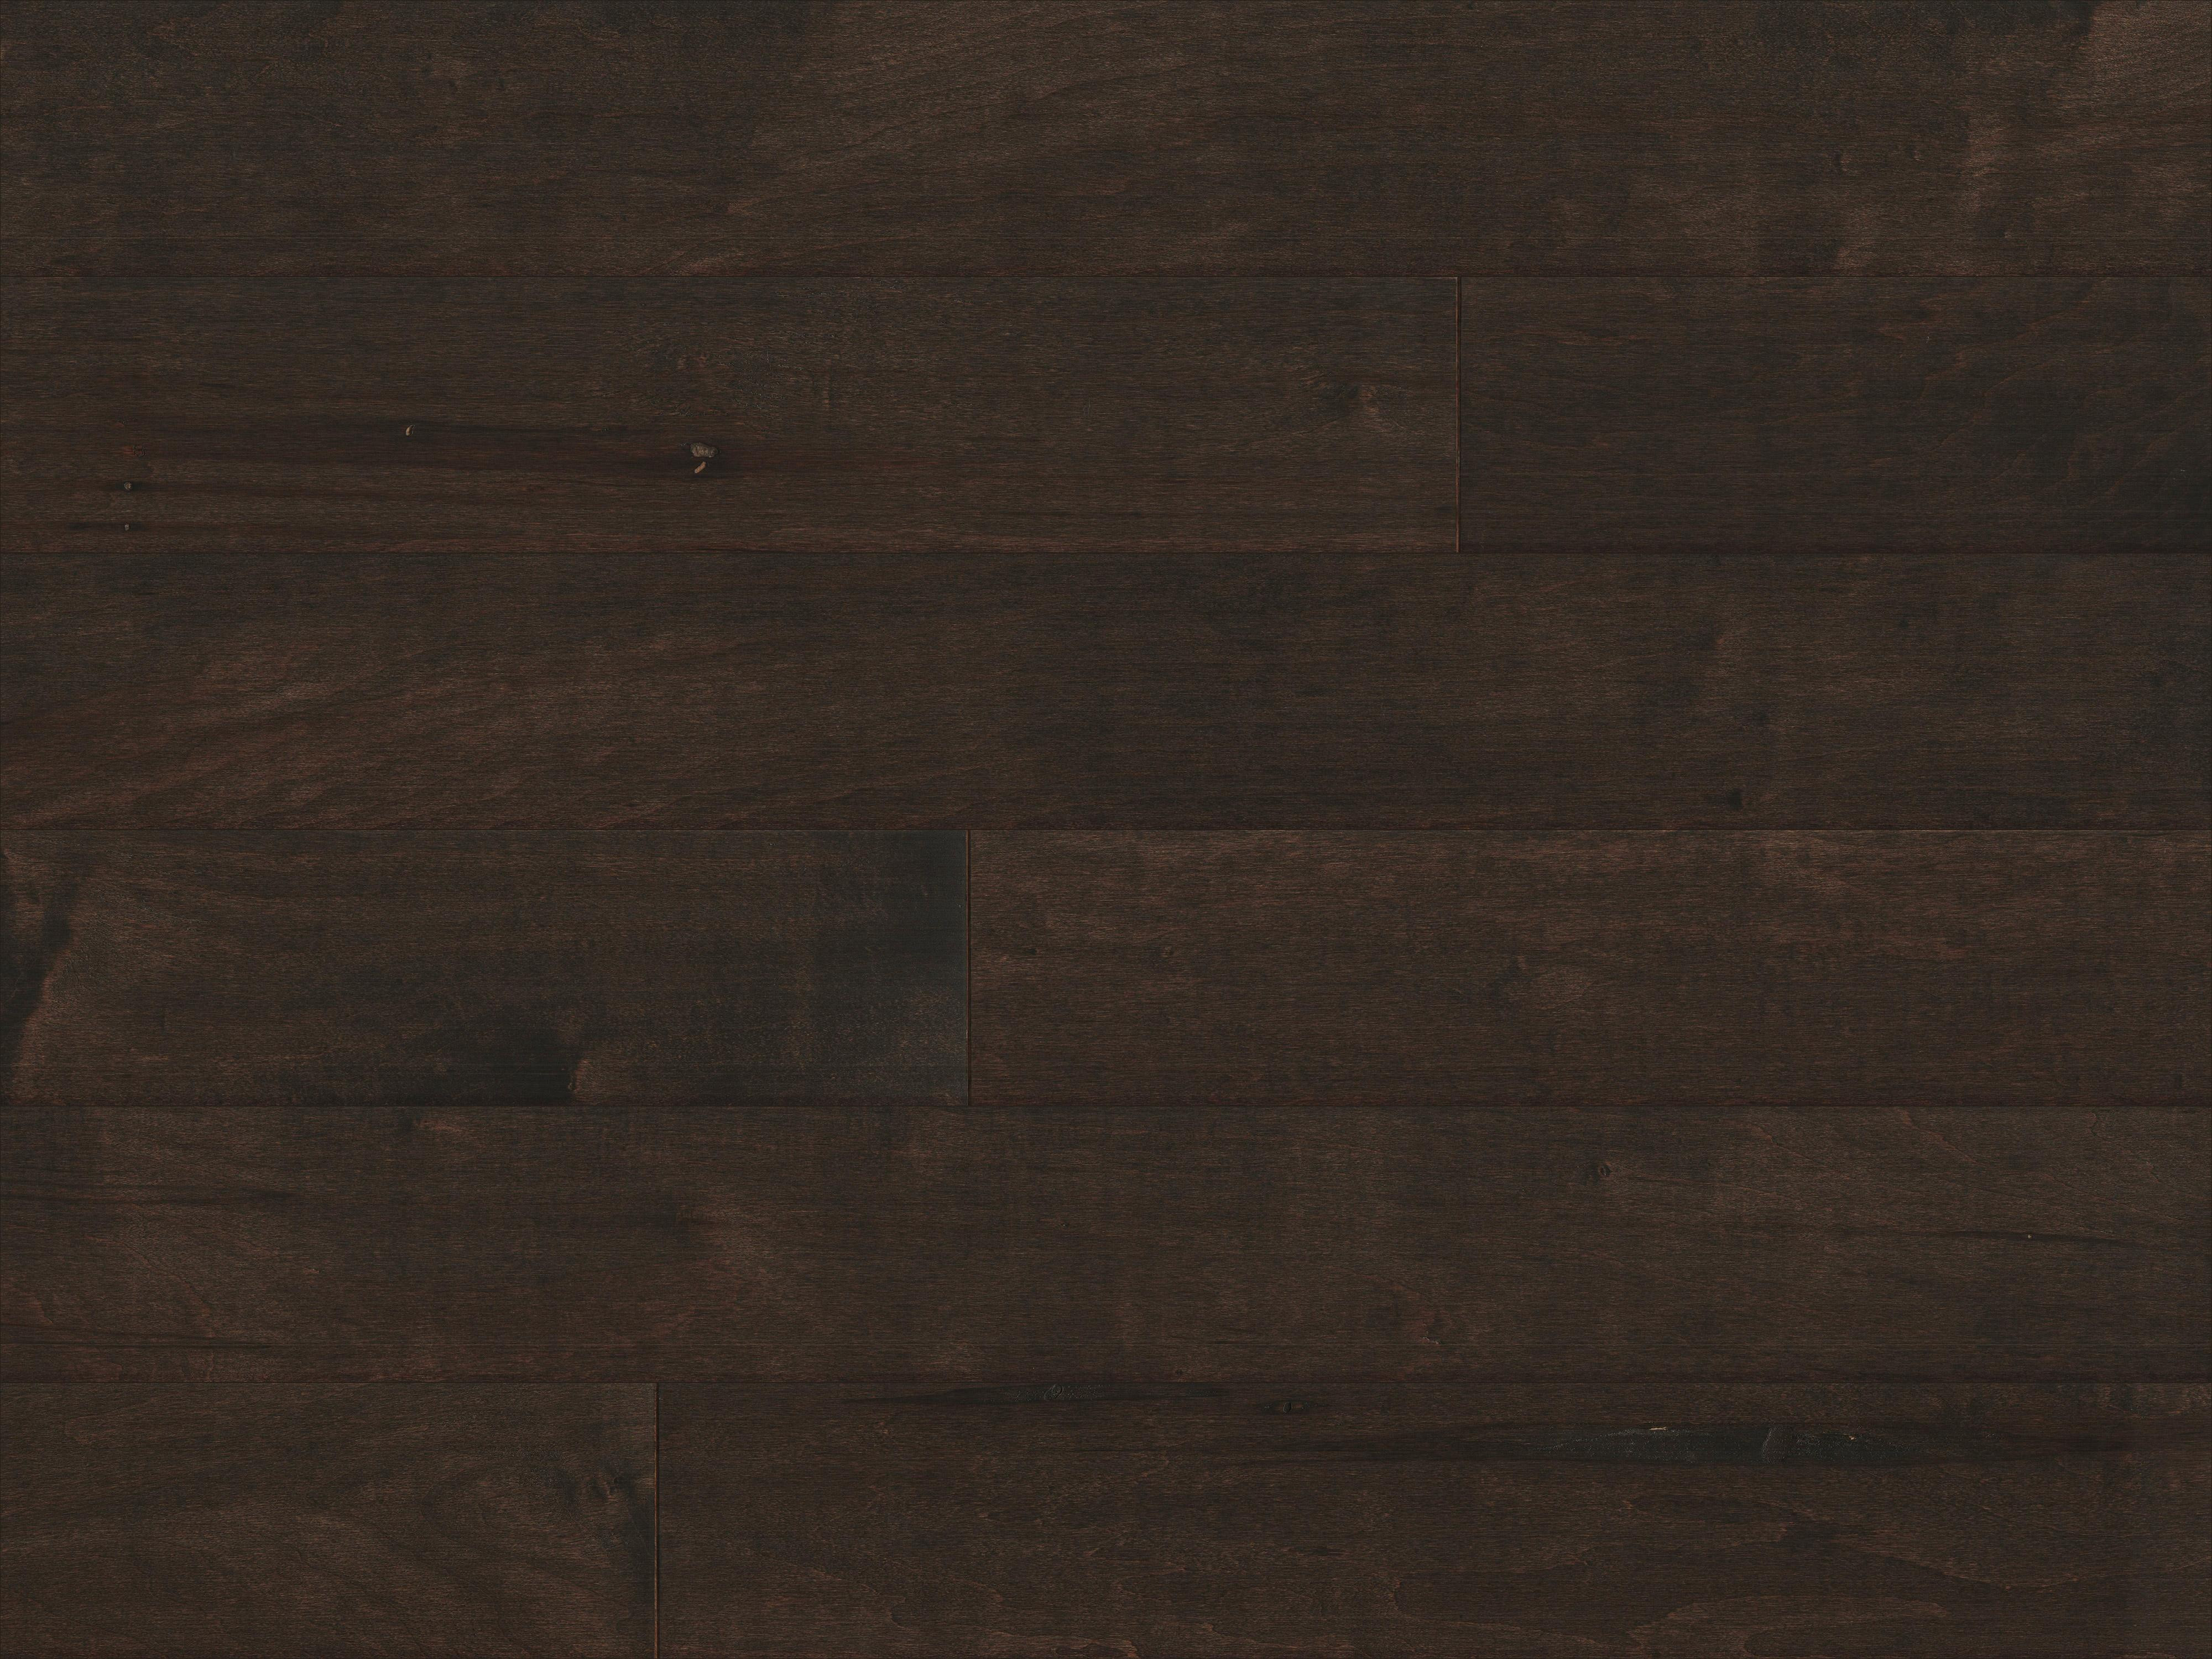 waterproof engineered hardwood flooring of mullican ridgecrest maple cappuccino 1 2 thick 5 wide engineered for mullican ridgecrest maple cappuccino 1 2 thick 5 wide engineered hardwood flooring